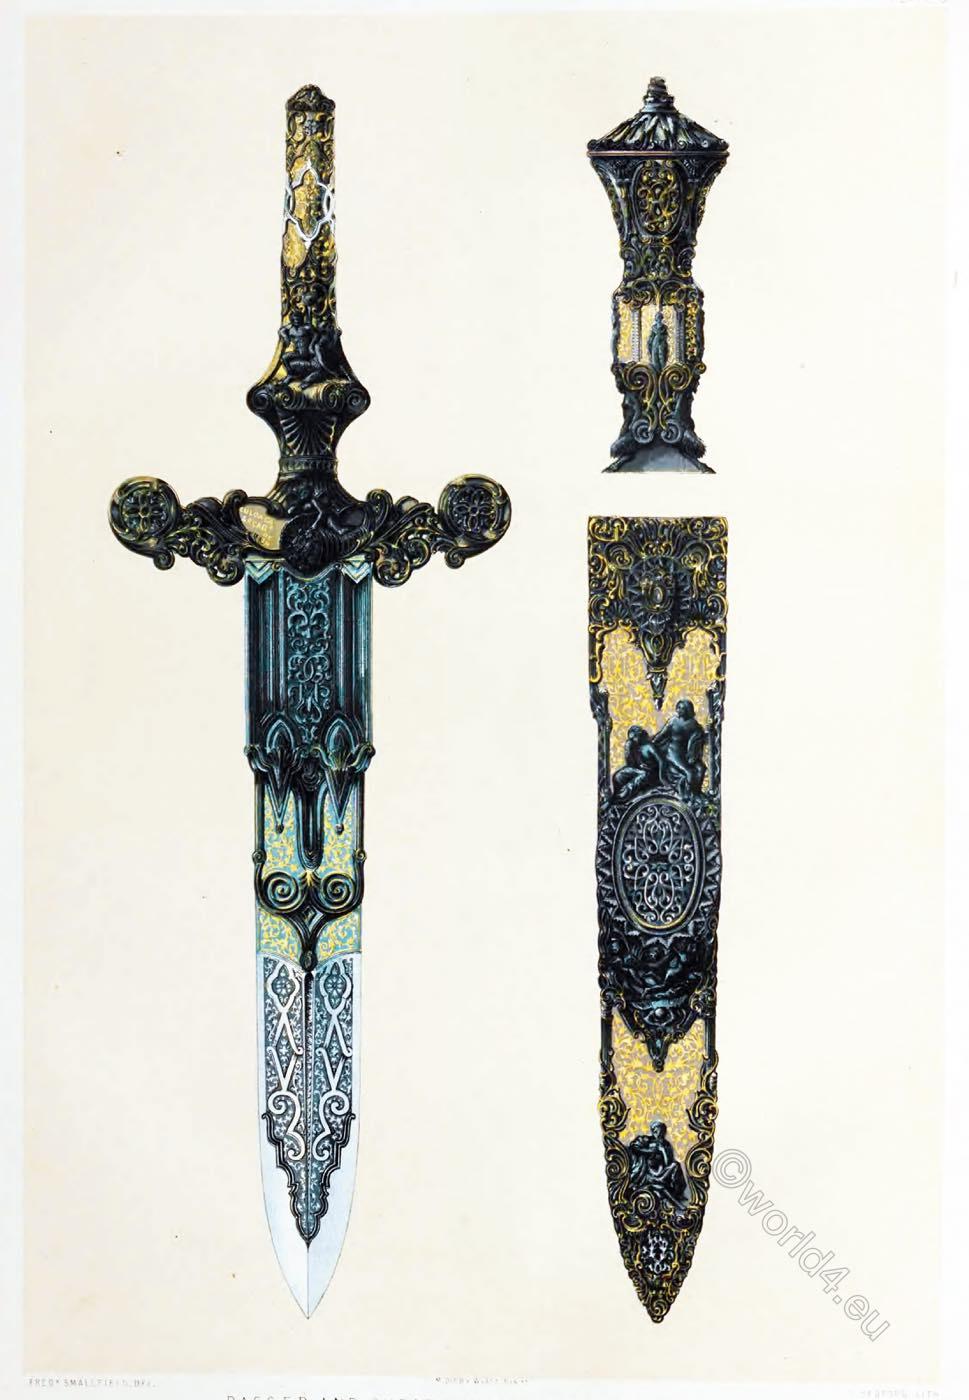 Hunting Knife, Eusebio Zuloaga, gunmaker, Royal Armory, Spain,